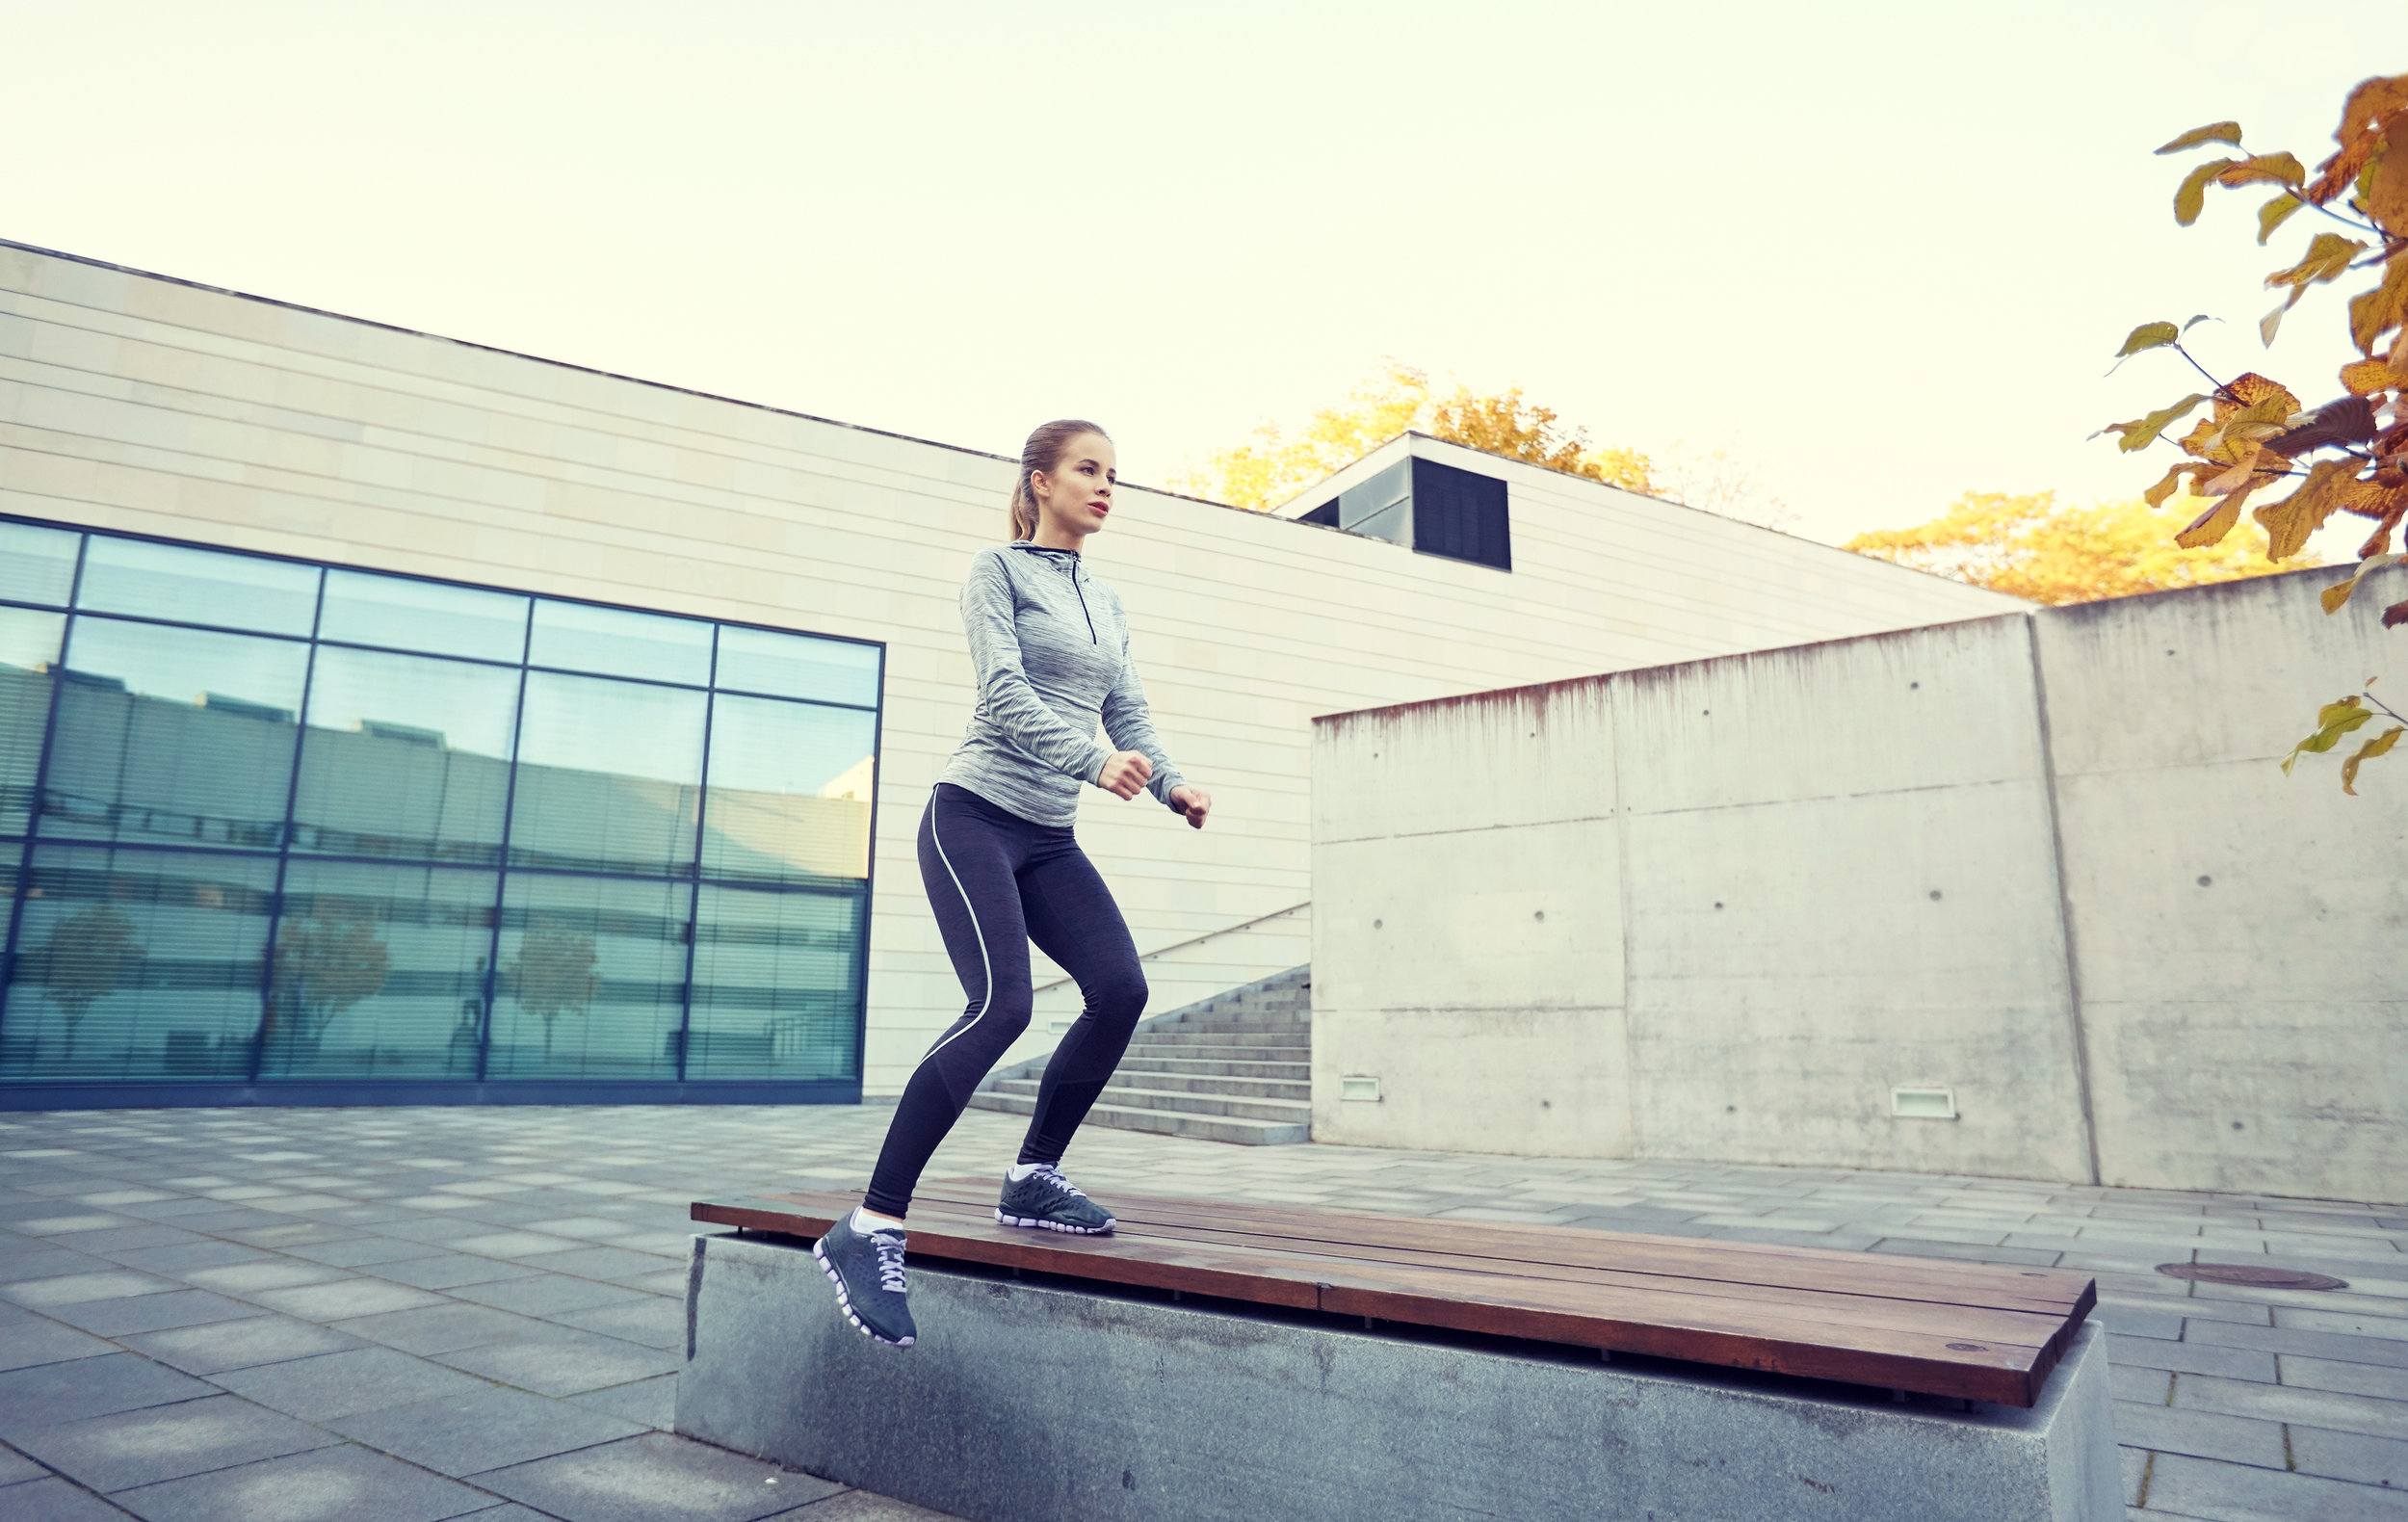 woman-exercising-on-bench-outdoors-PHVLWHS.jpg